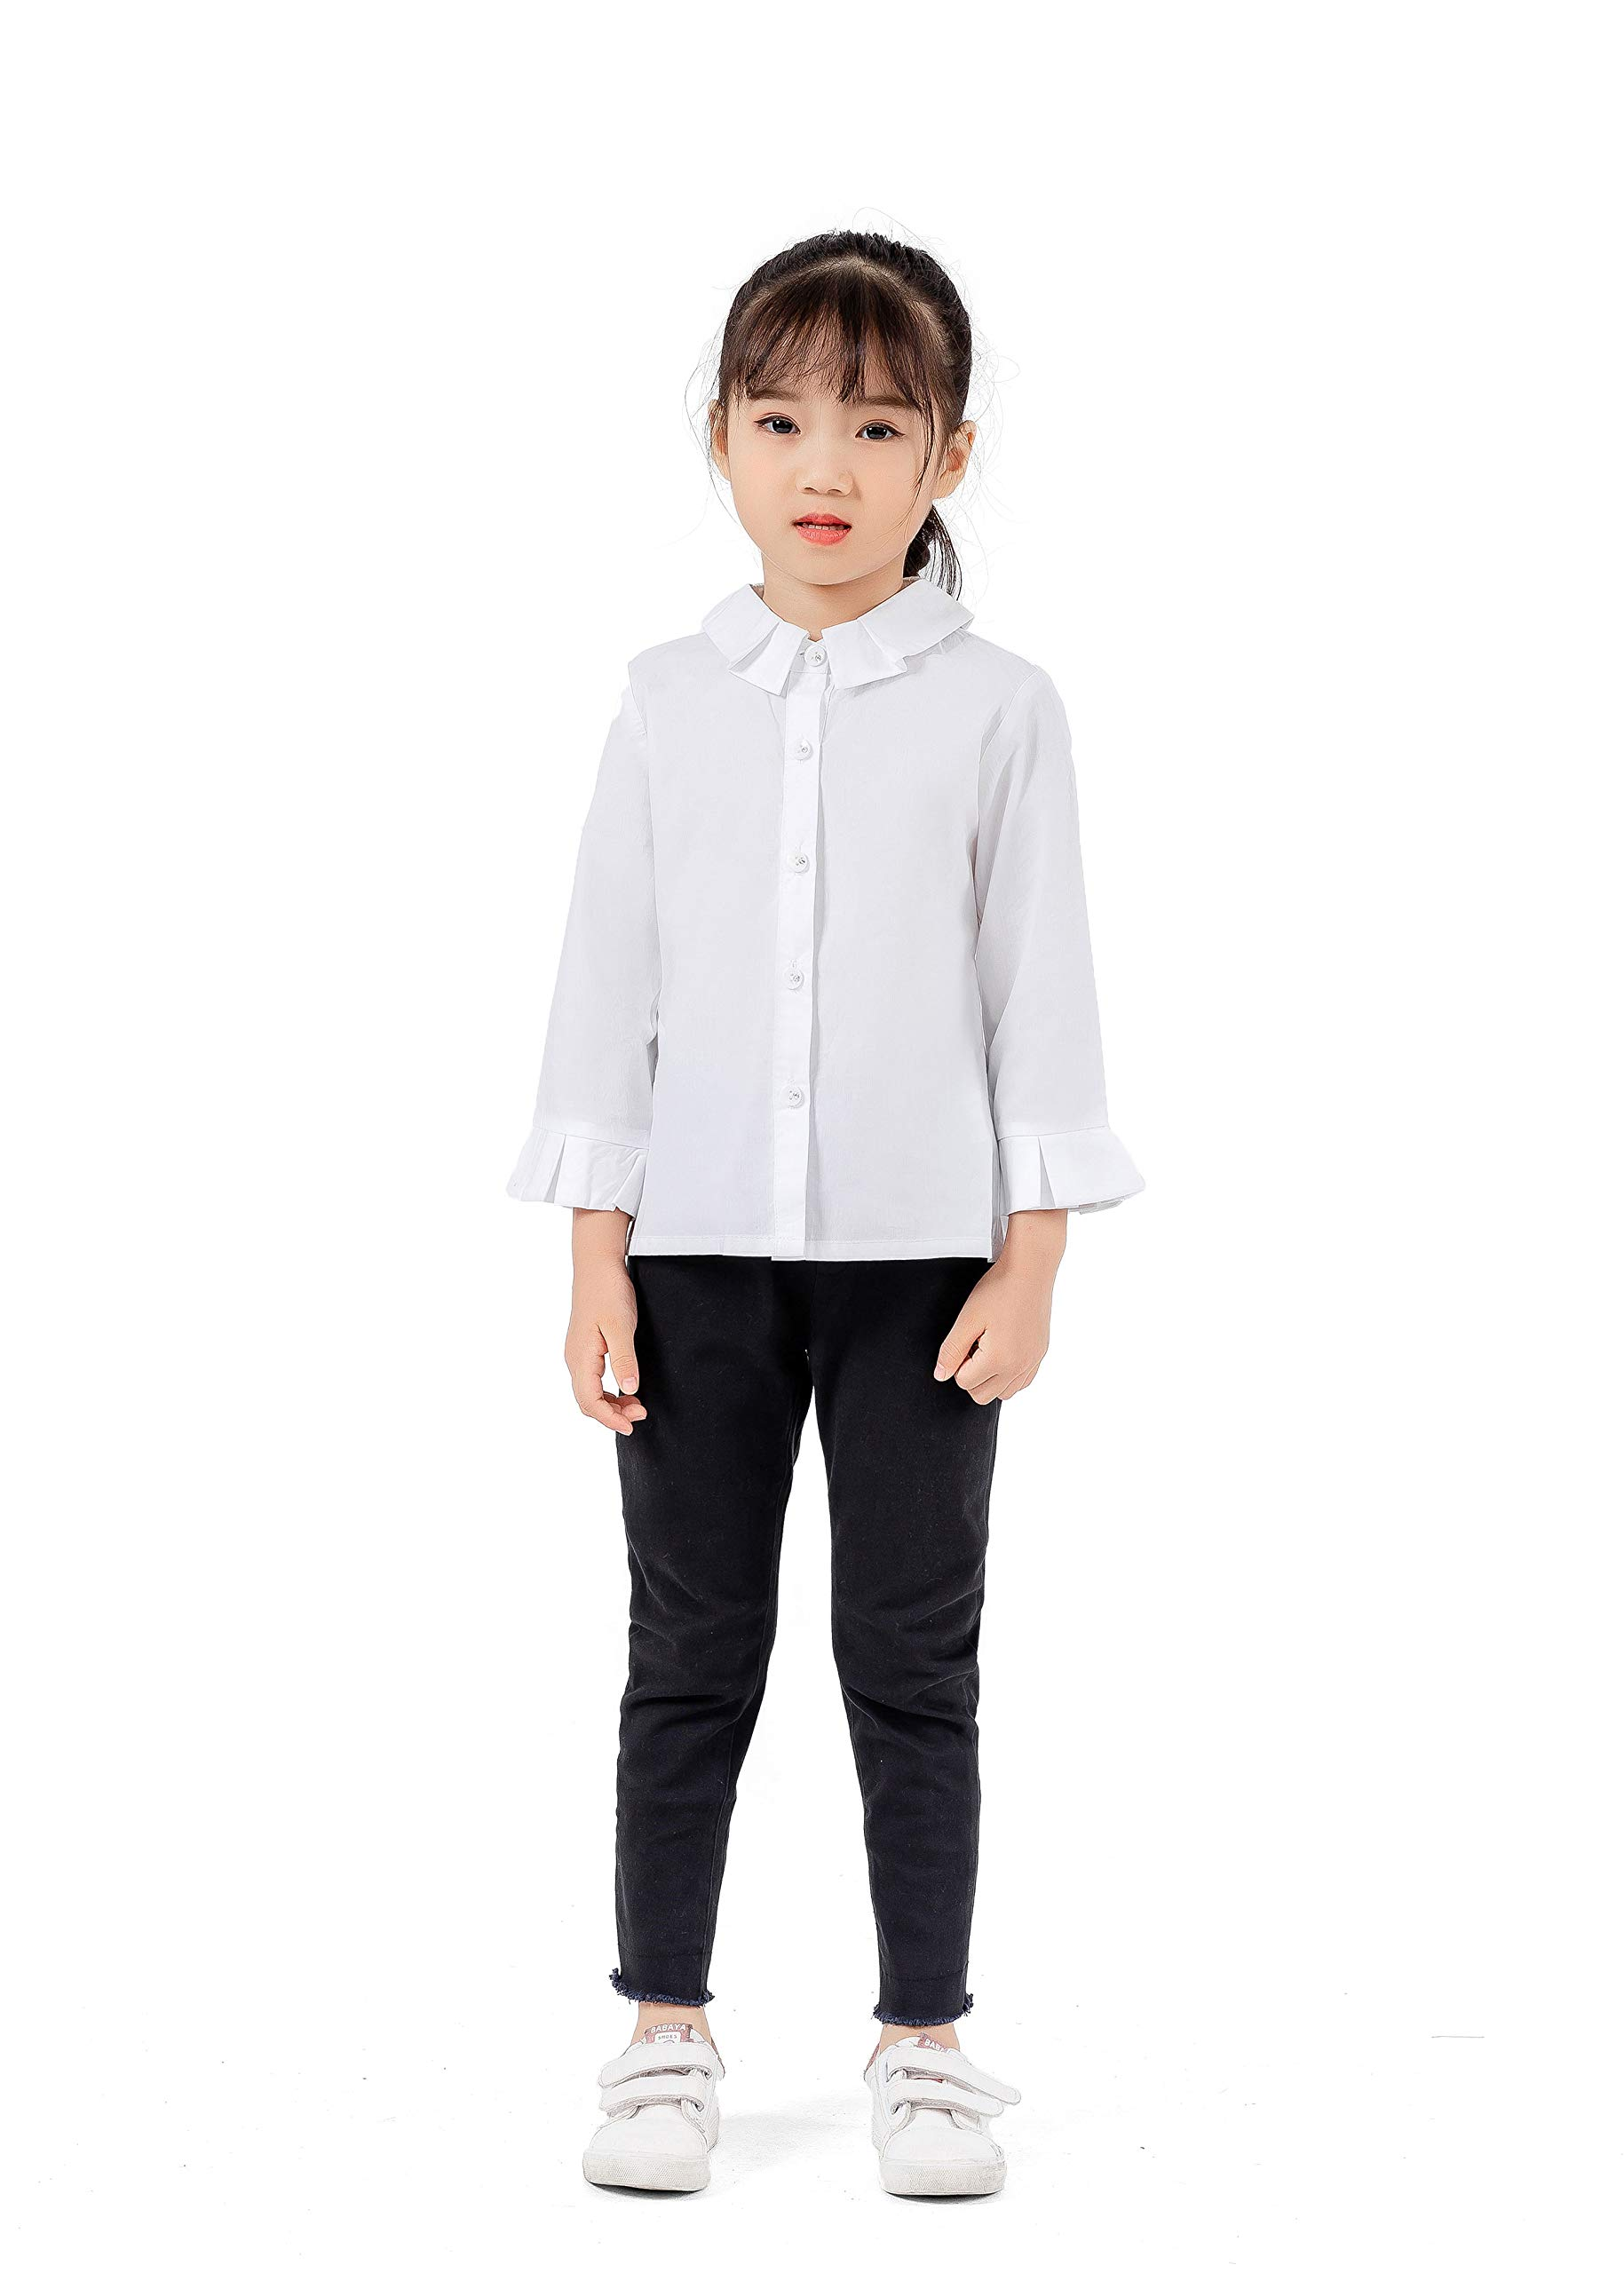 Magkay Kids Big Girls Frayed Elastic Trousers Plain Soft Pants Black 7Y-8Y